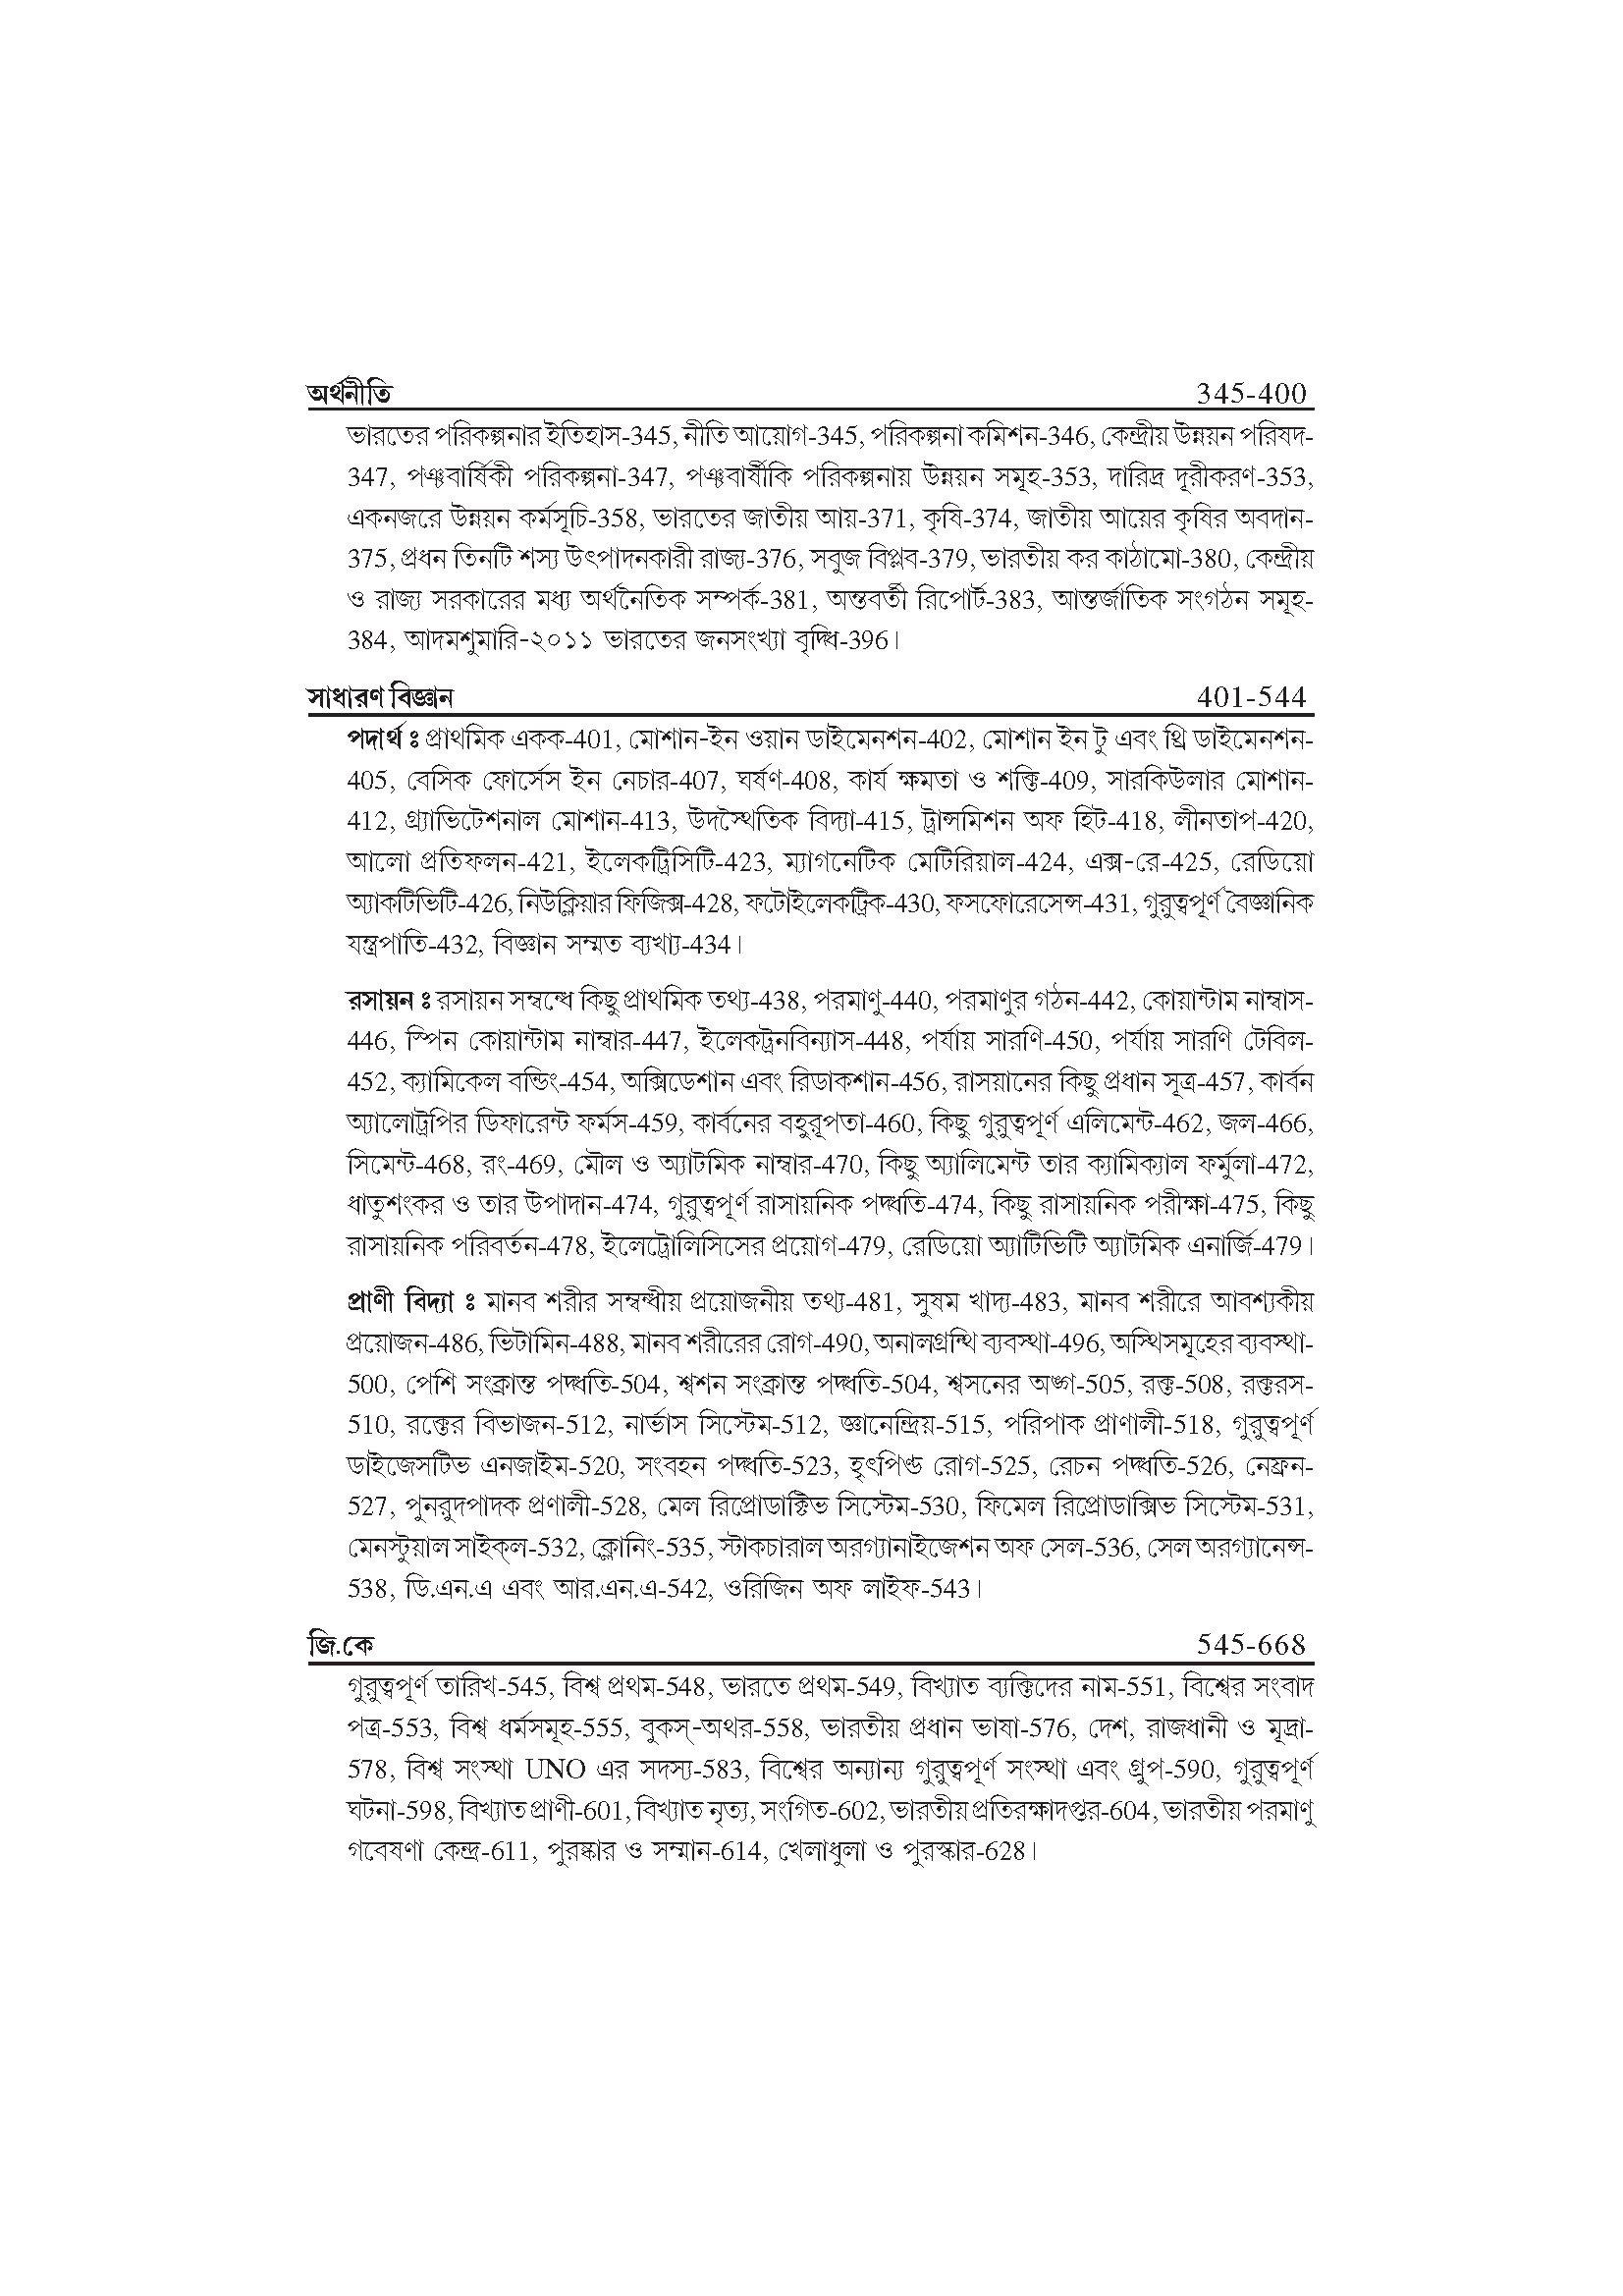 General Knowledge Book 2015 Pdf In Bengali